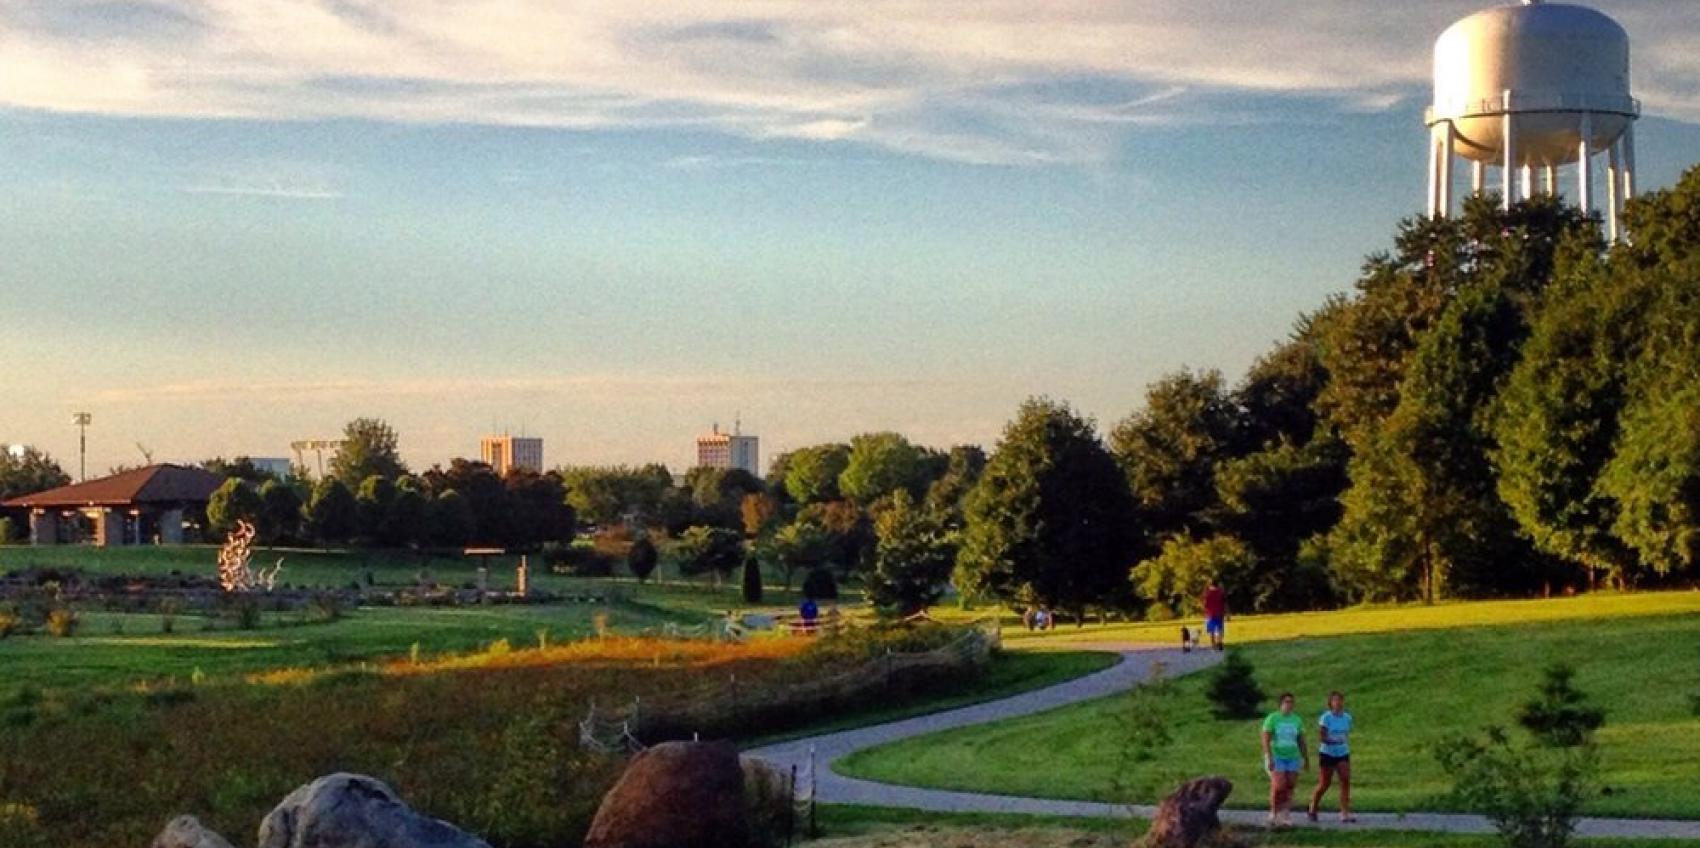 The Arboretum State Botanical Garden Of Kentucky American Public Gardens Association